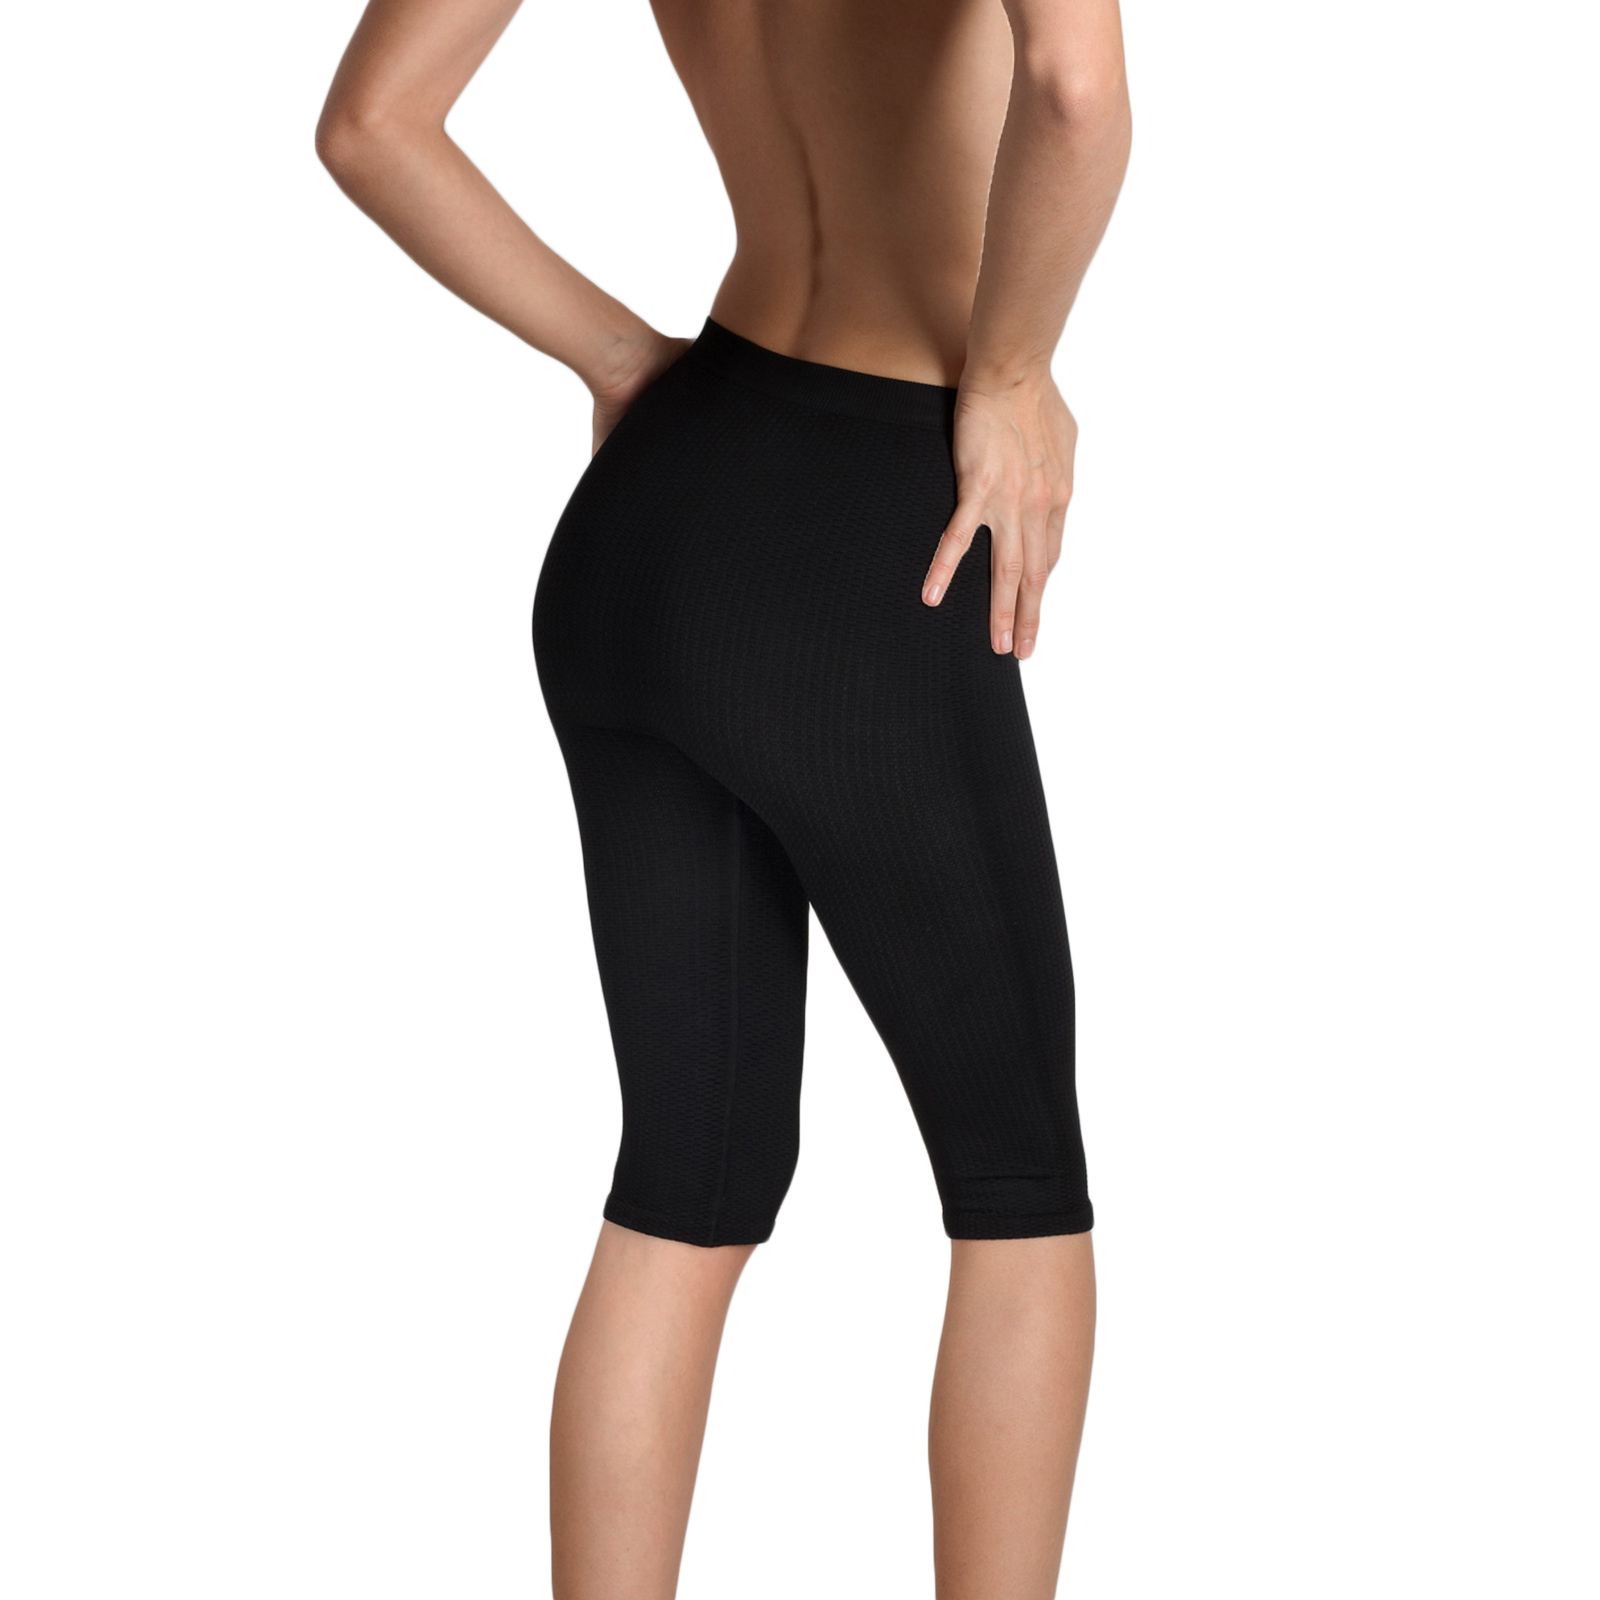 Body Shaper Lytess Slim Max Waist Slimming Thigh Underwear Capri ...